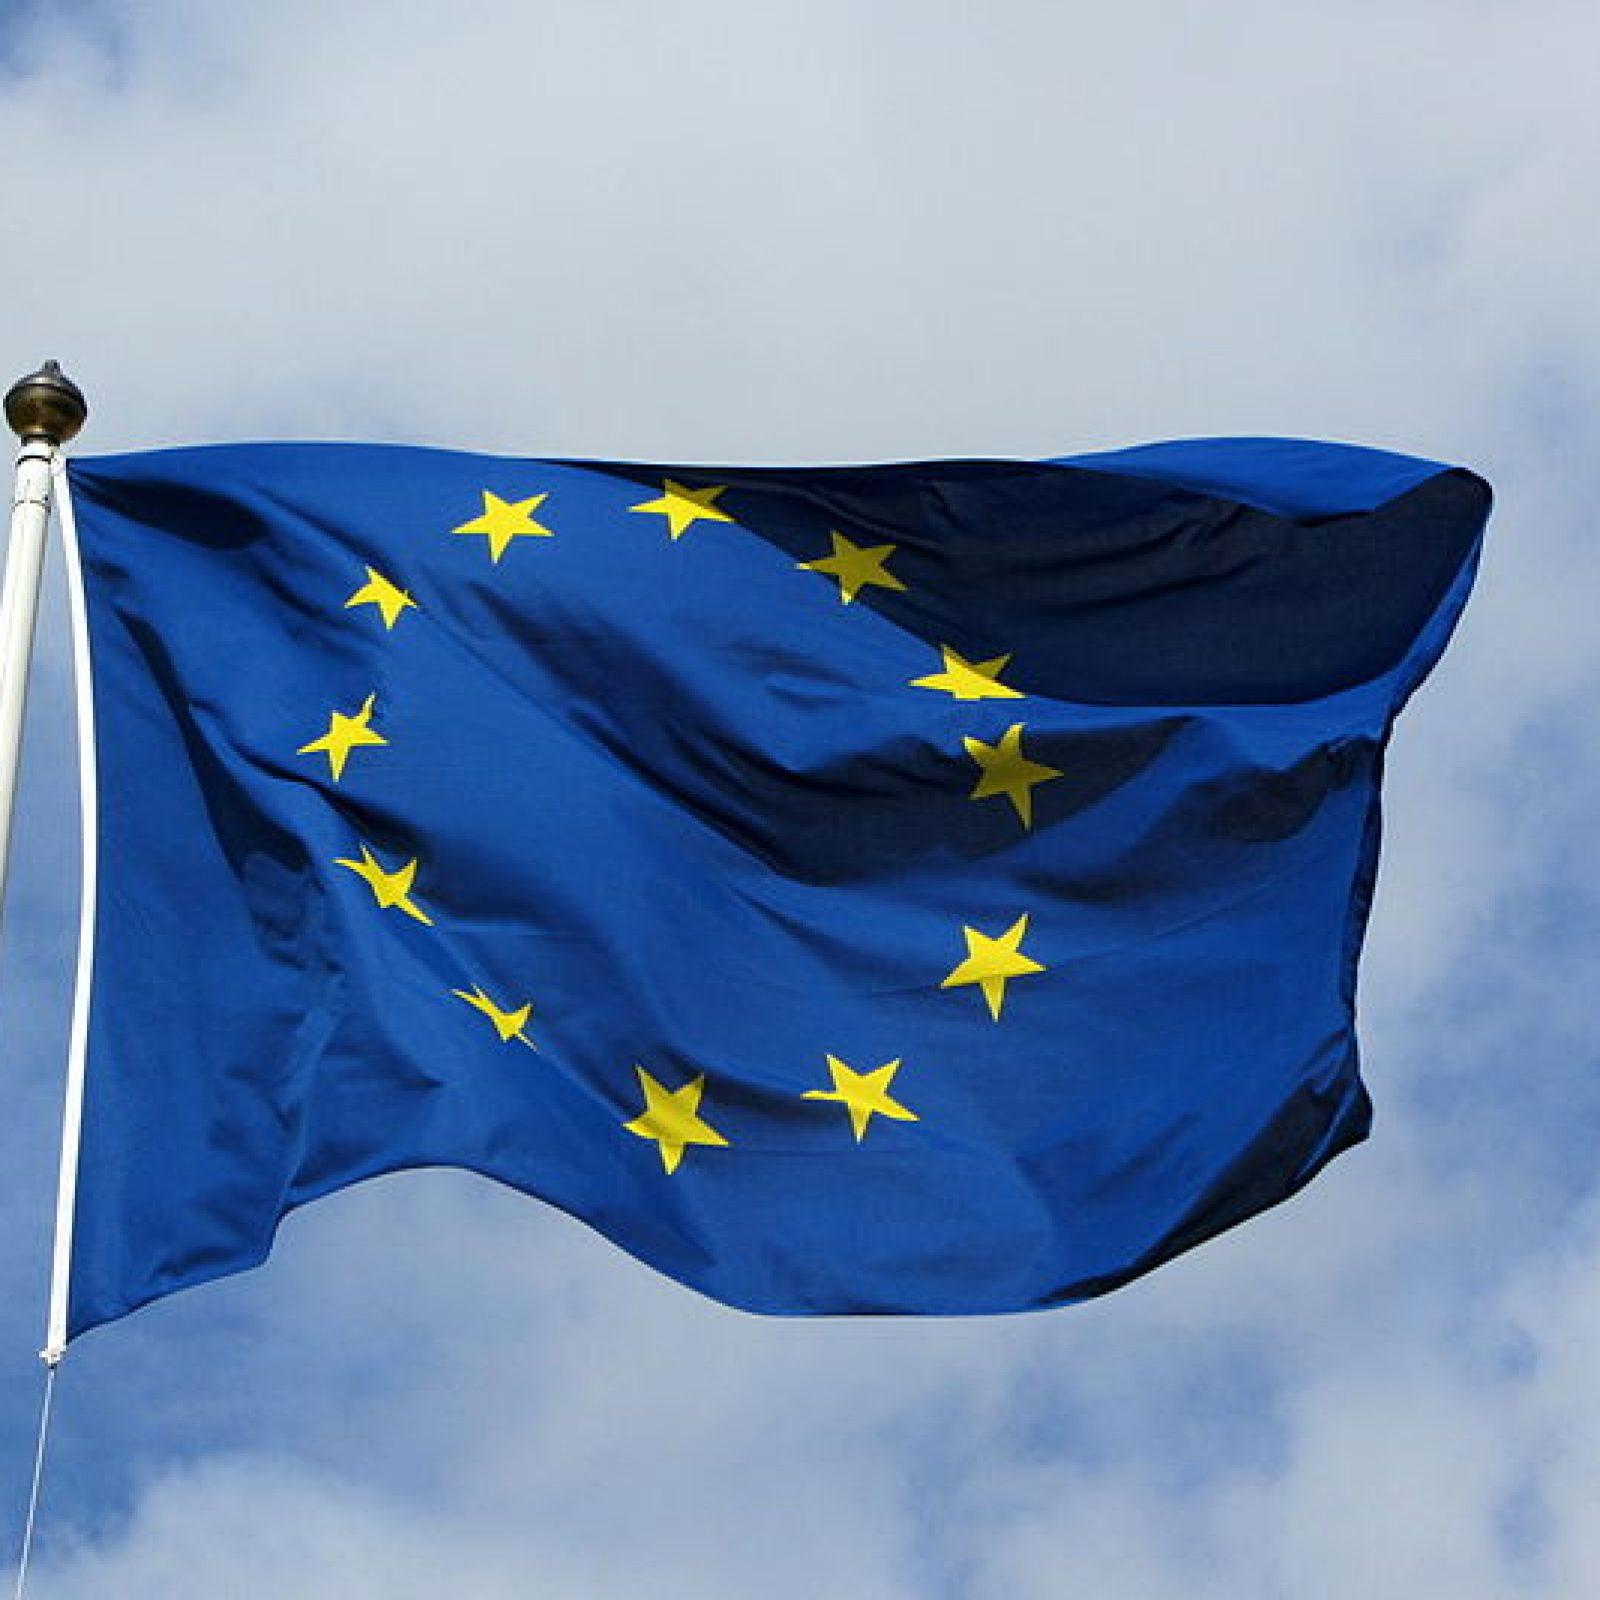 800px-European_flag_in_Karlskrona_2011